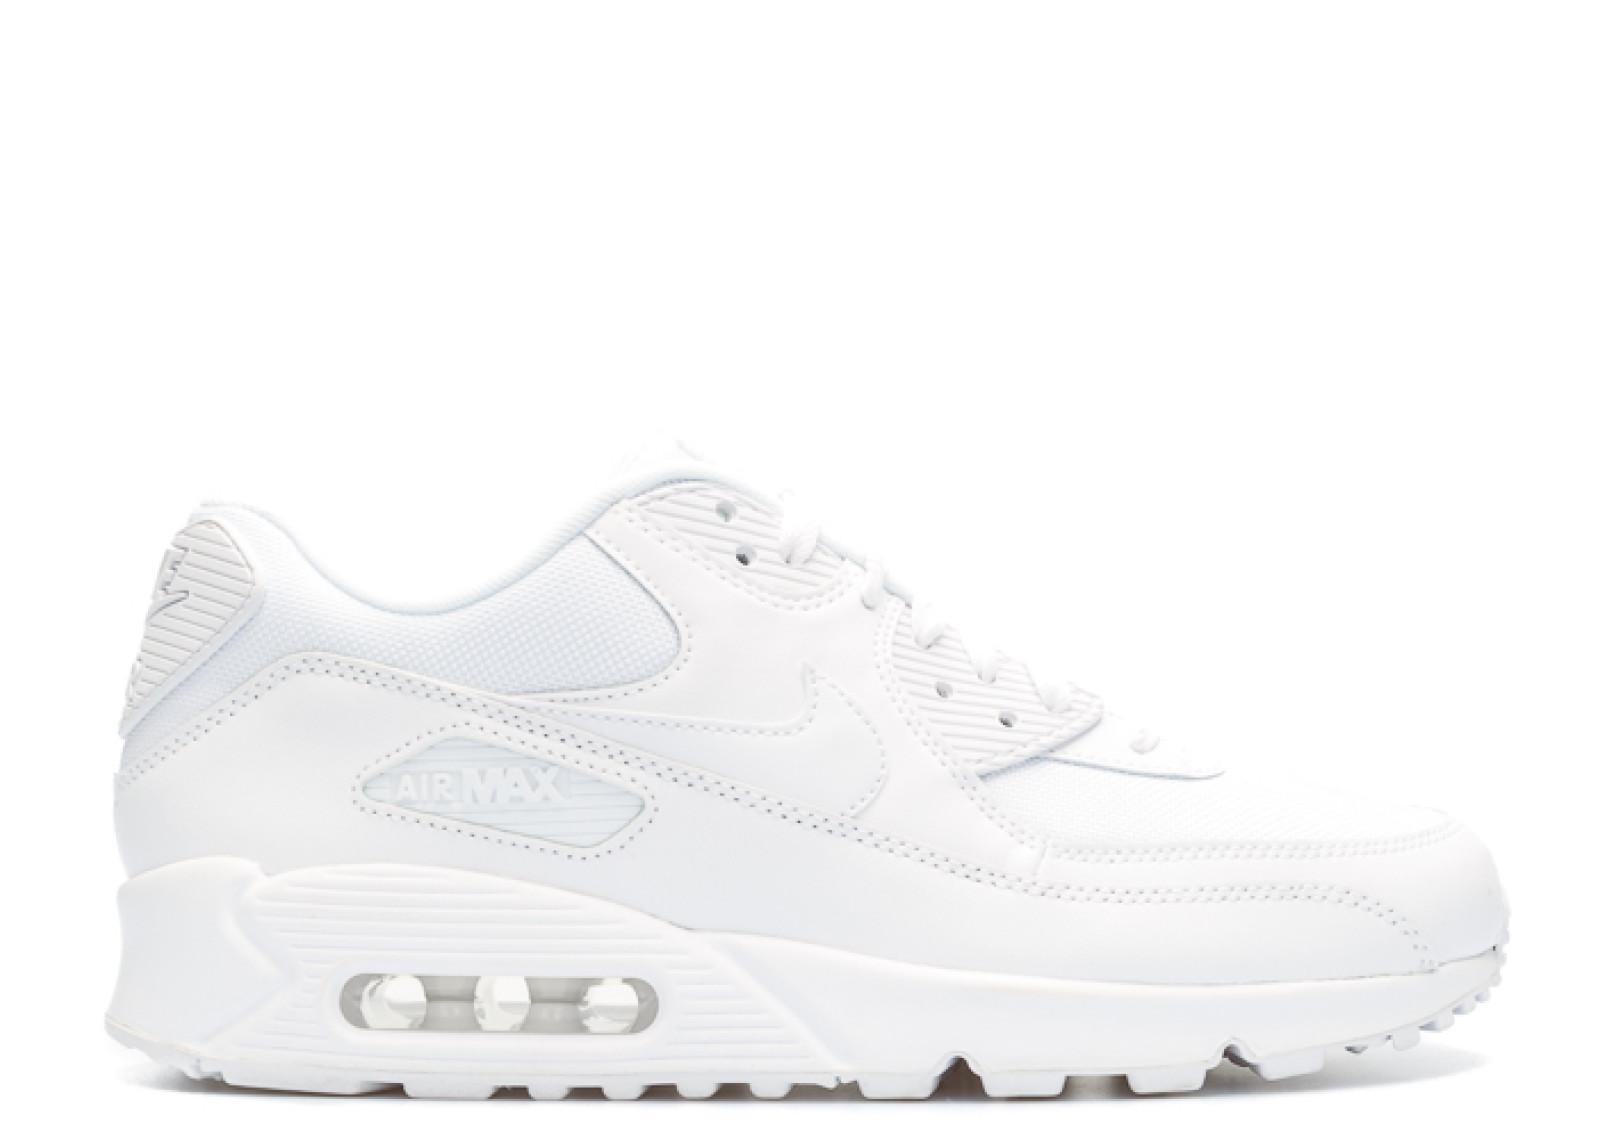 Nike obuv Air Max '90 Essential white Velikost: 10.5